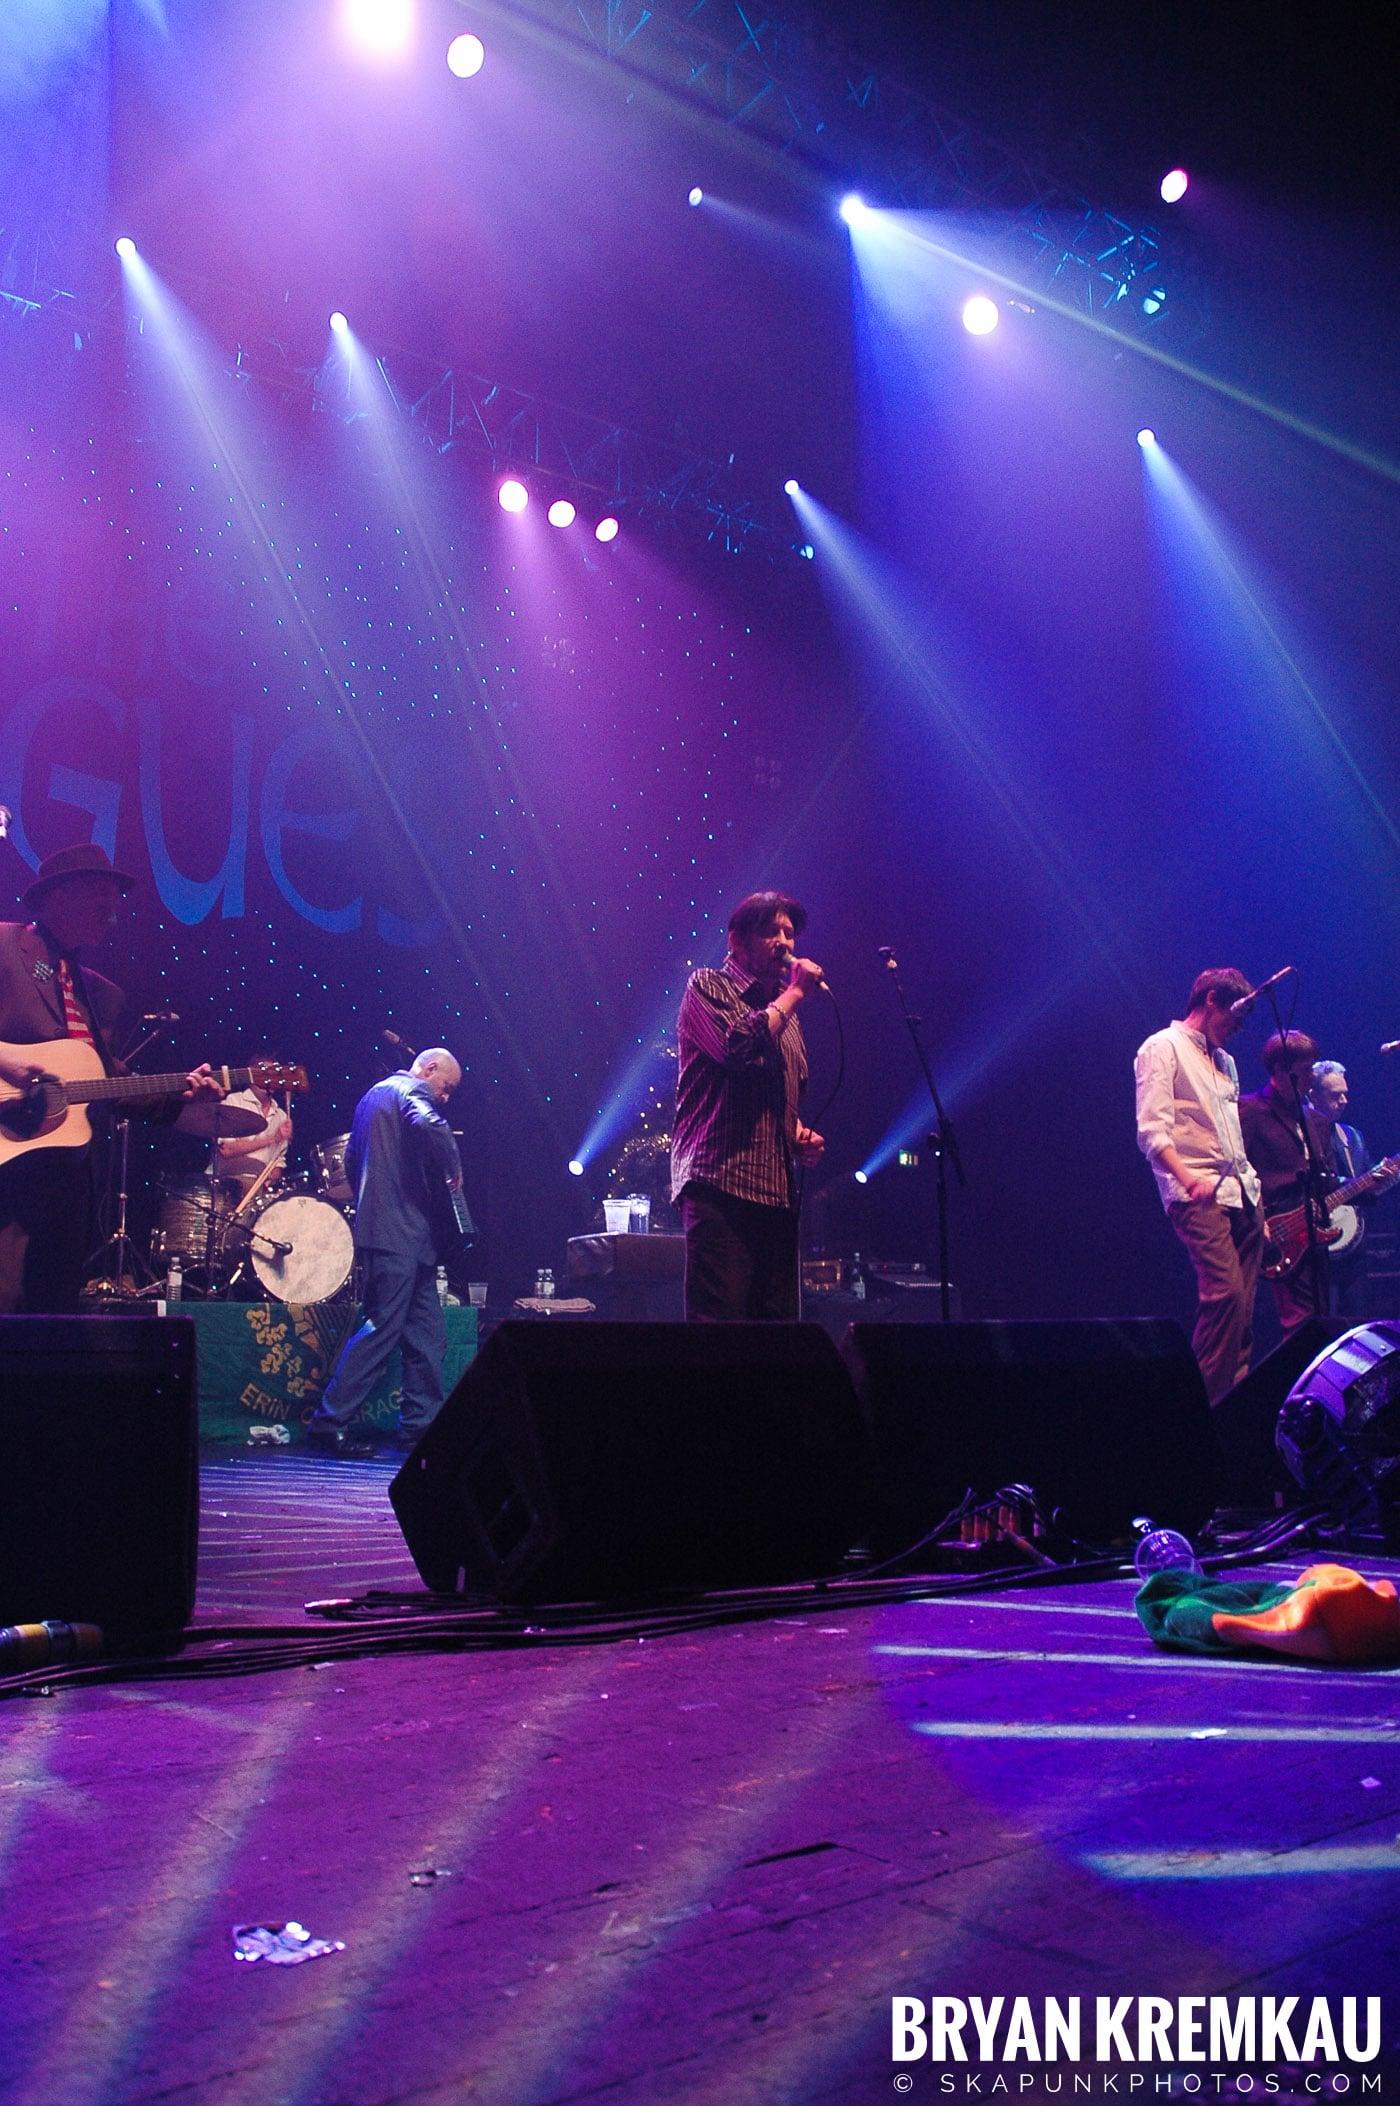 The Pogues @ Brixton Academy, London UK - 12.19.05 (14)